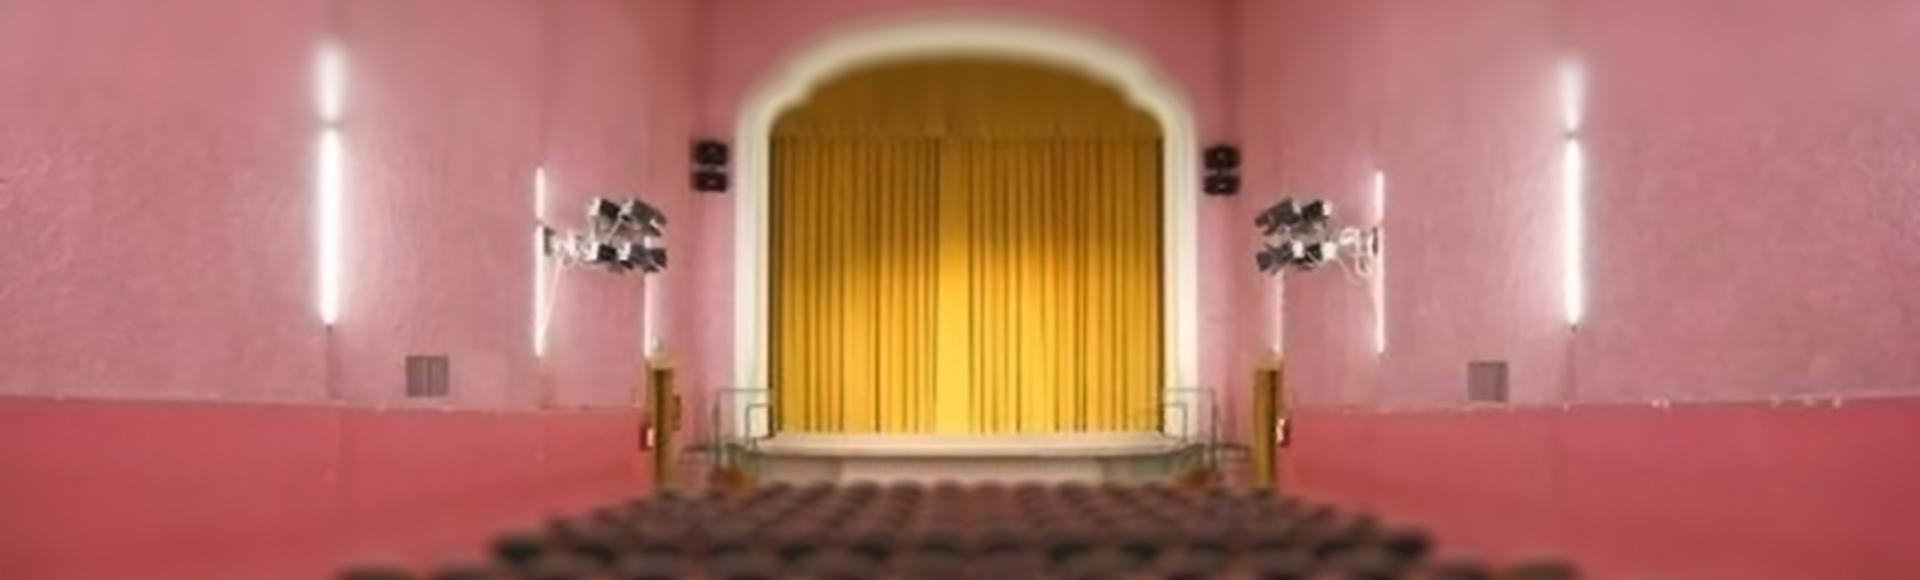 Teatro Serenissimo